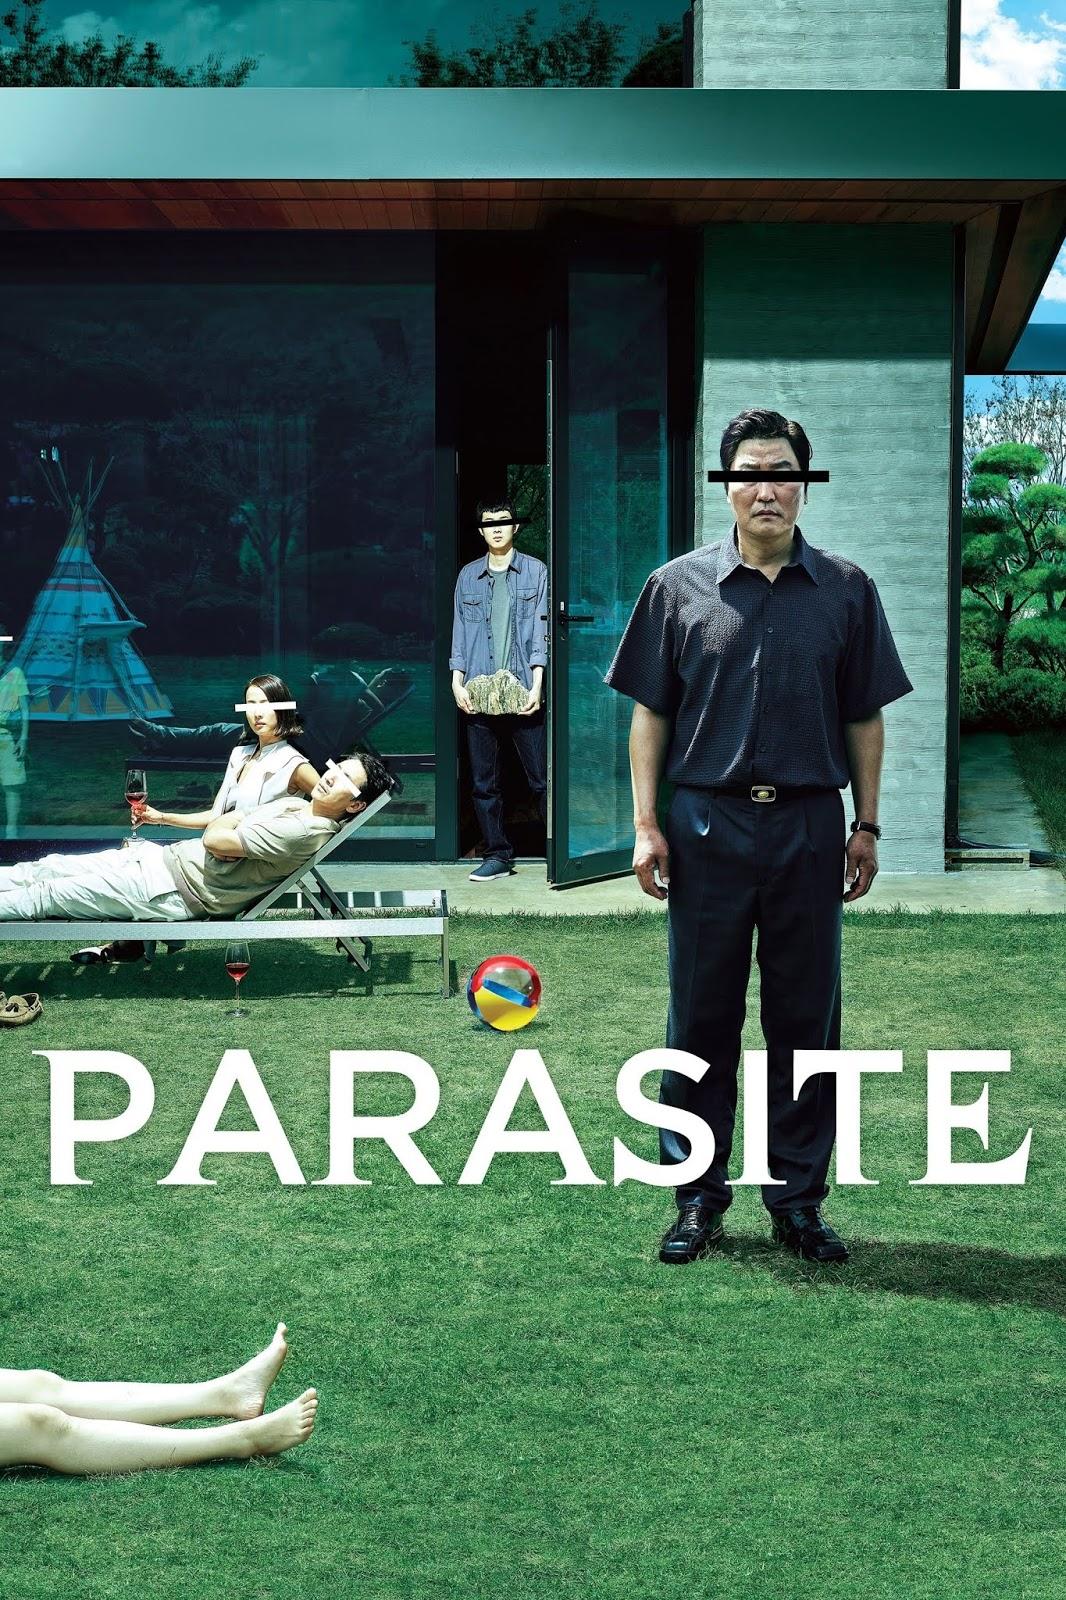 Free Download Parasite (2019) Bluray Subtitle Indo/English